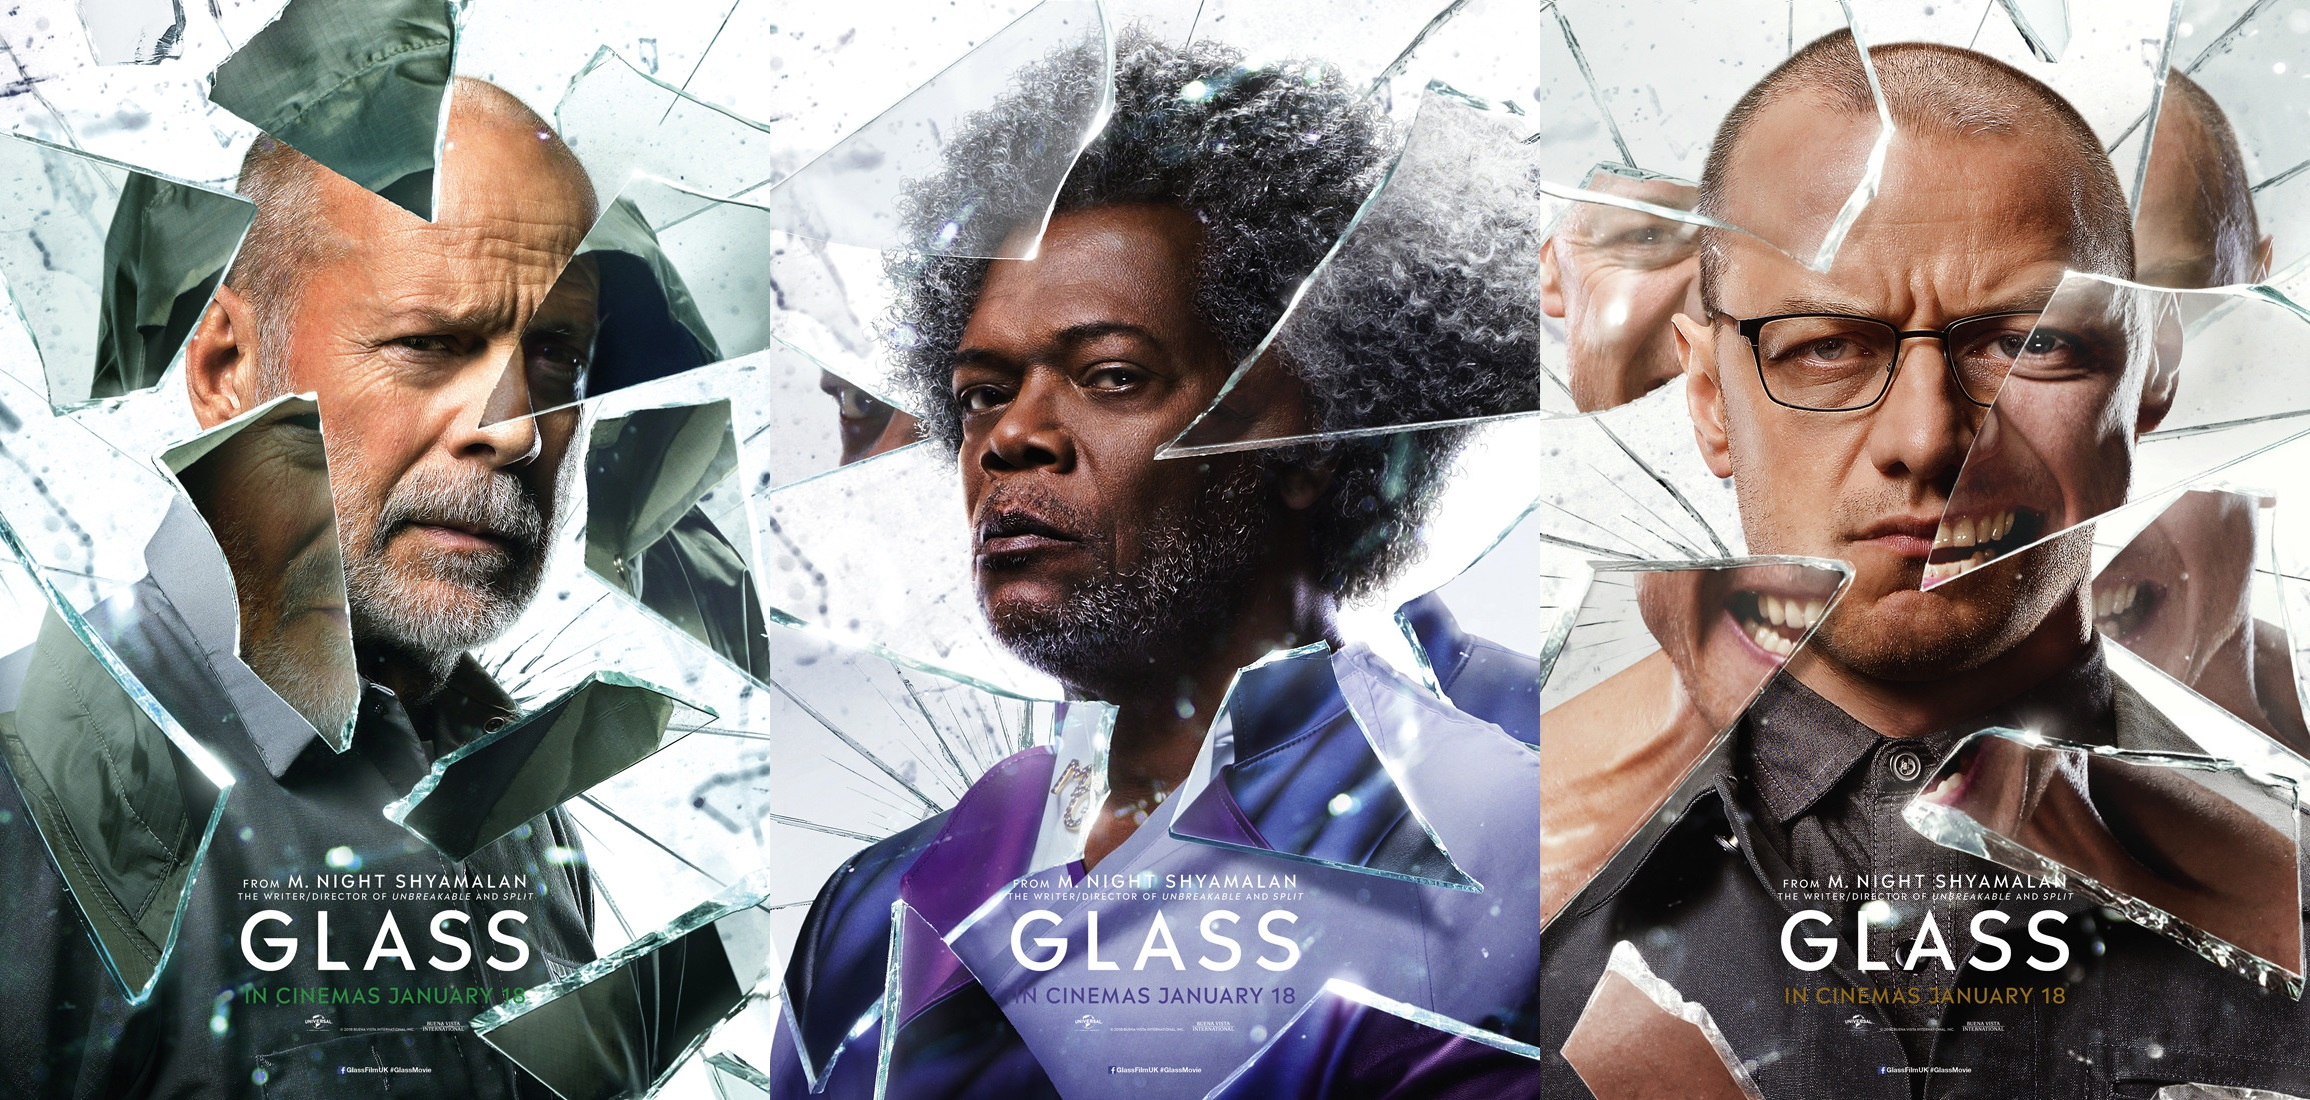 glass_ver4_xlg.jpg